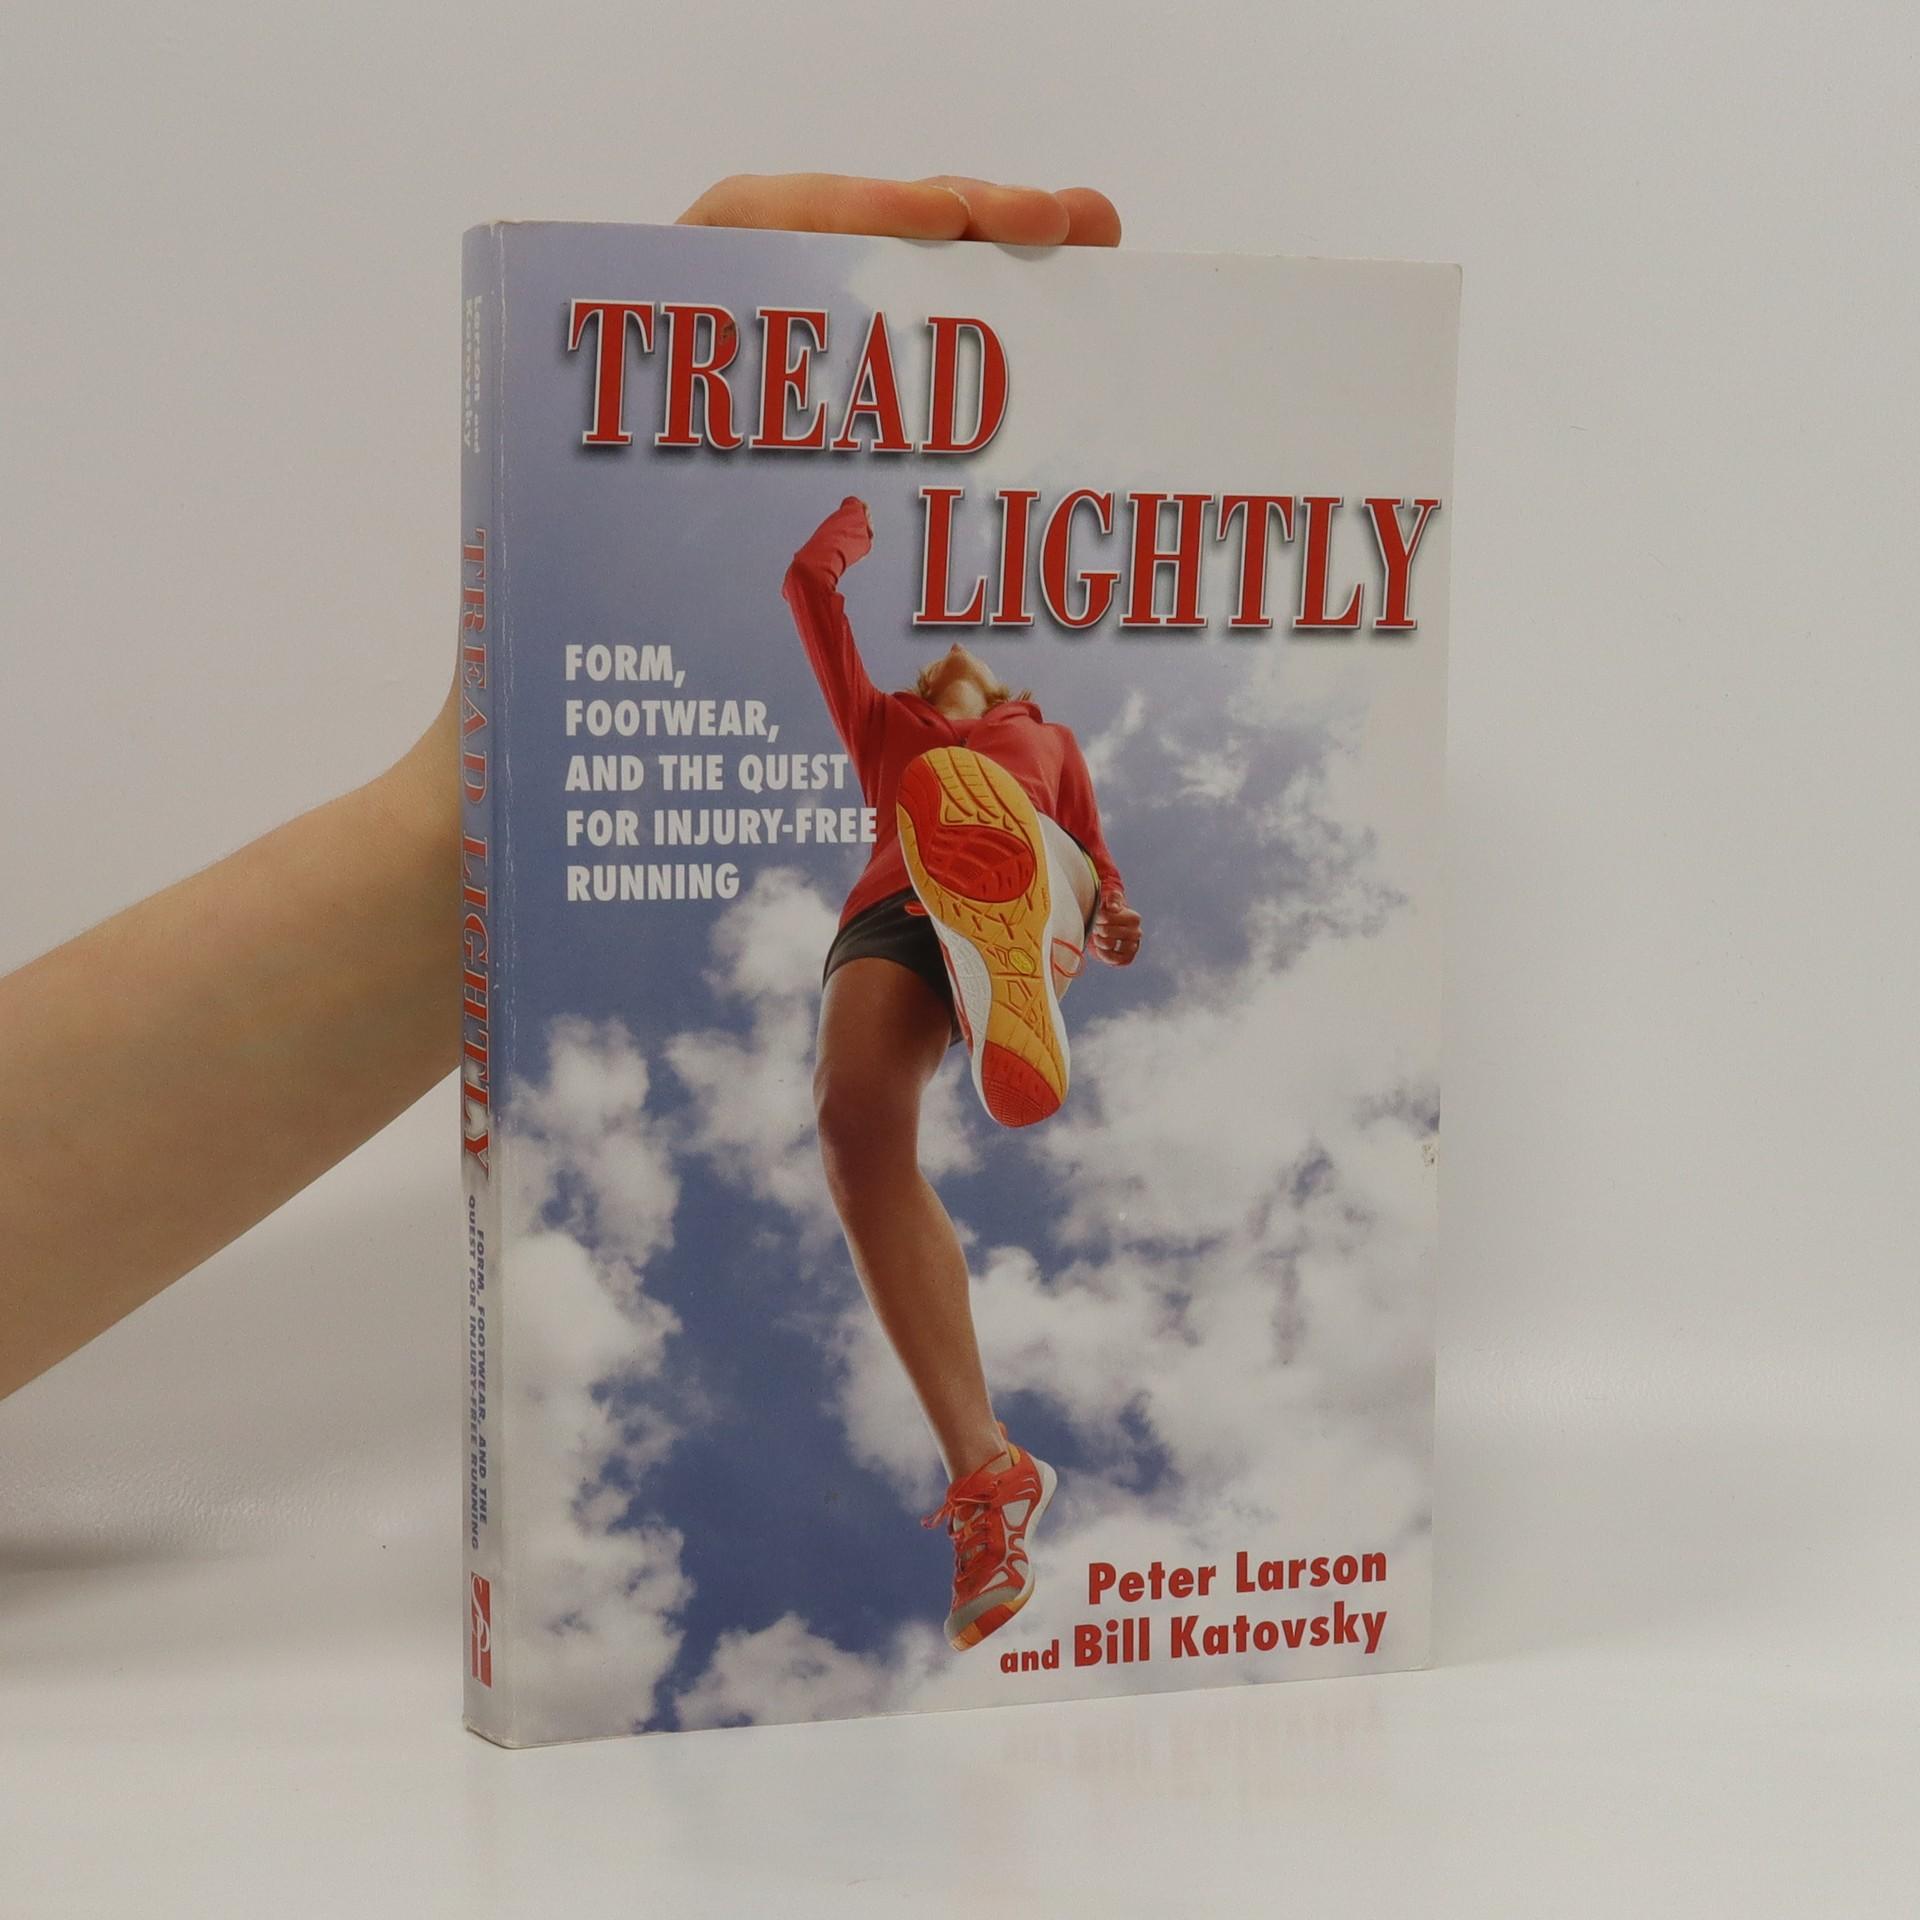 antikvární kniha Tread Lightly, neuveden